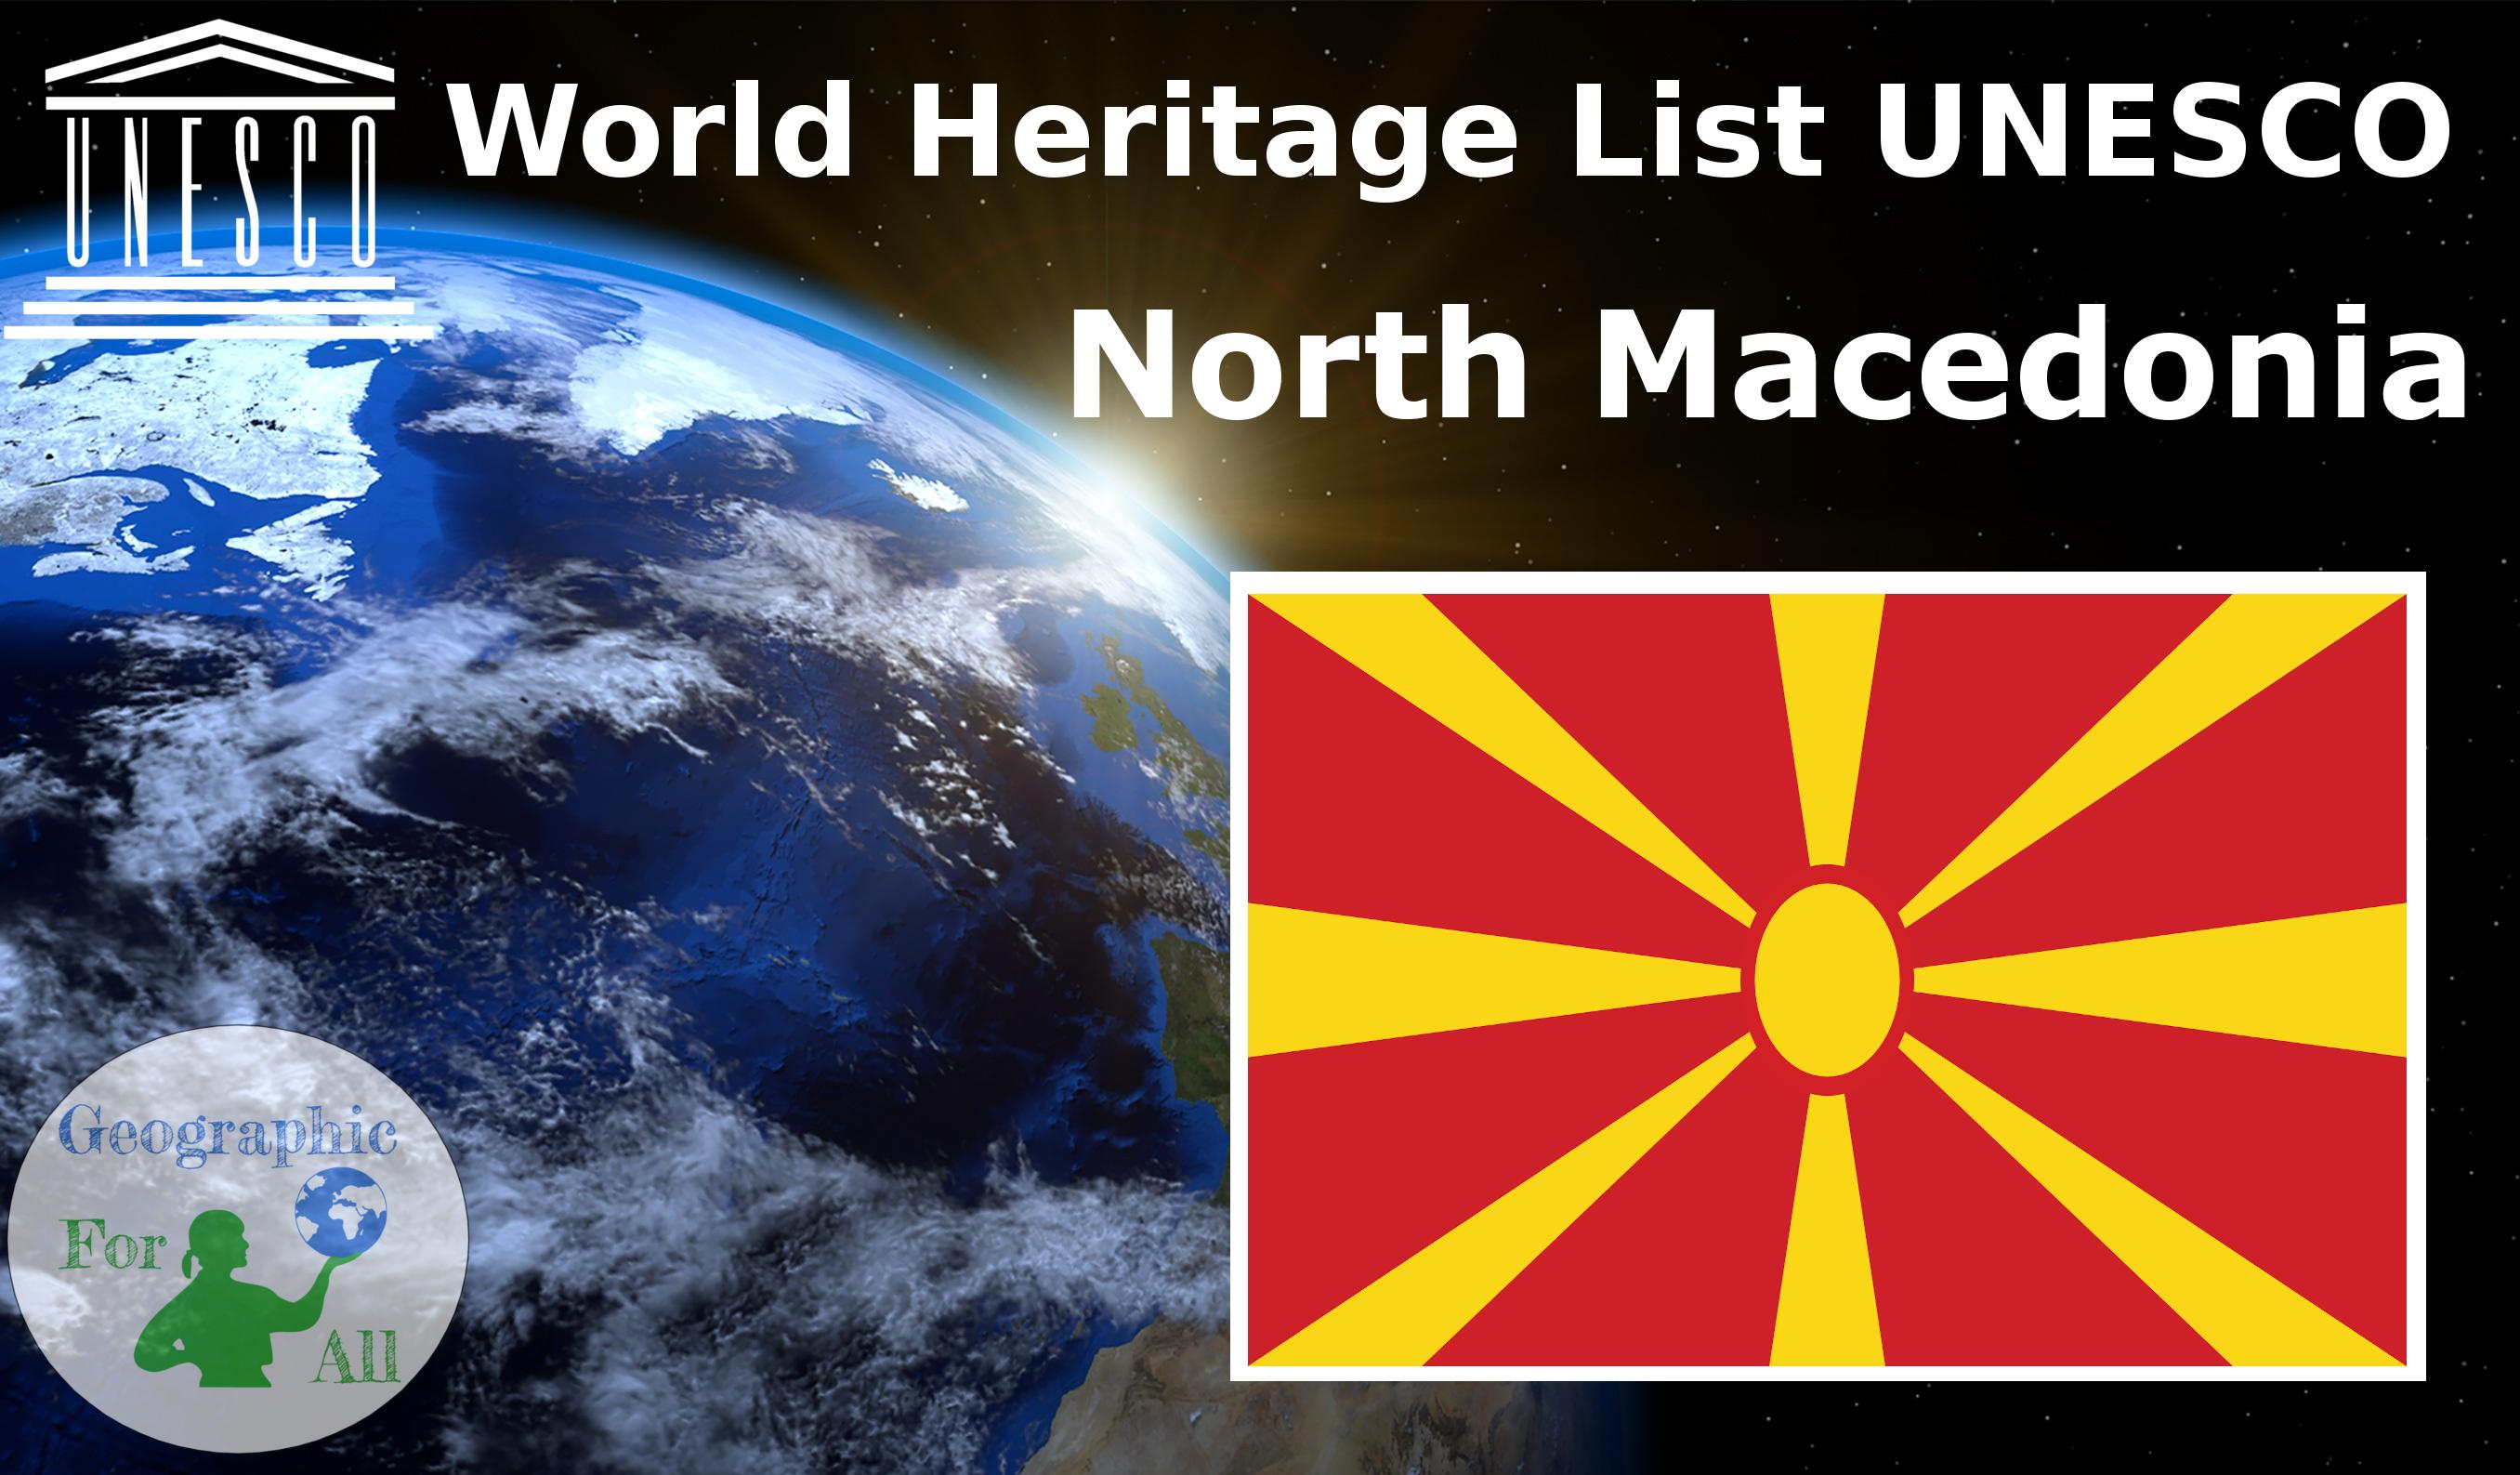 World Heritage List UNESCO - North Macedonia